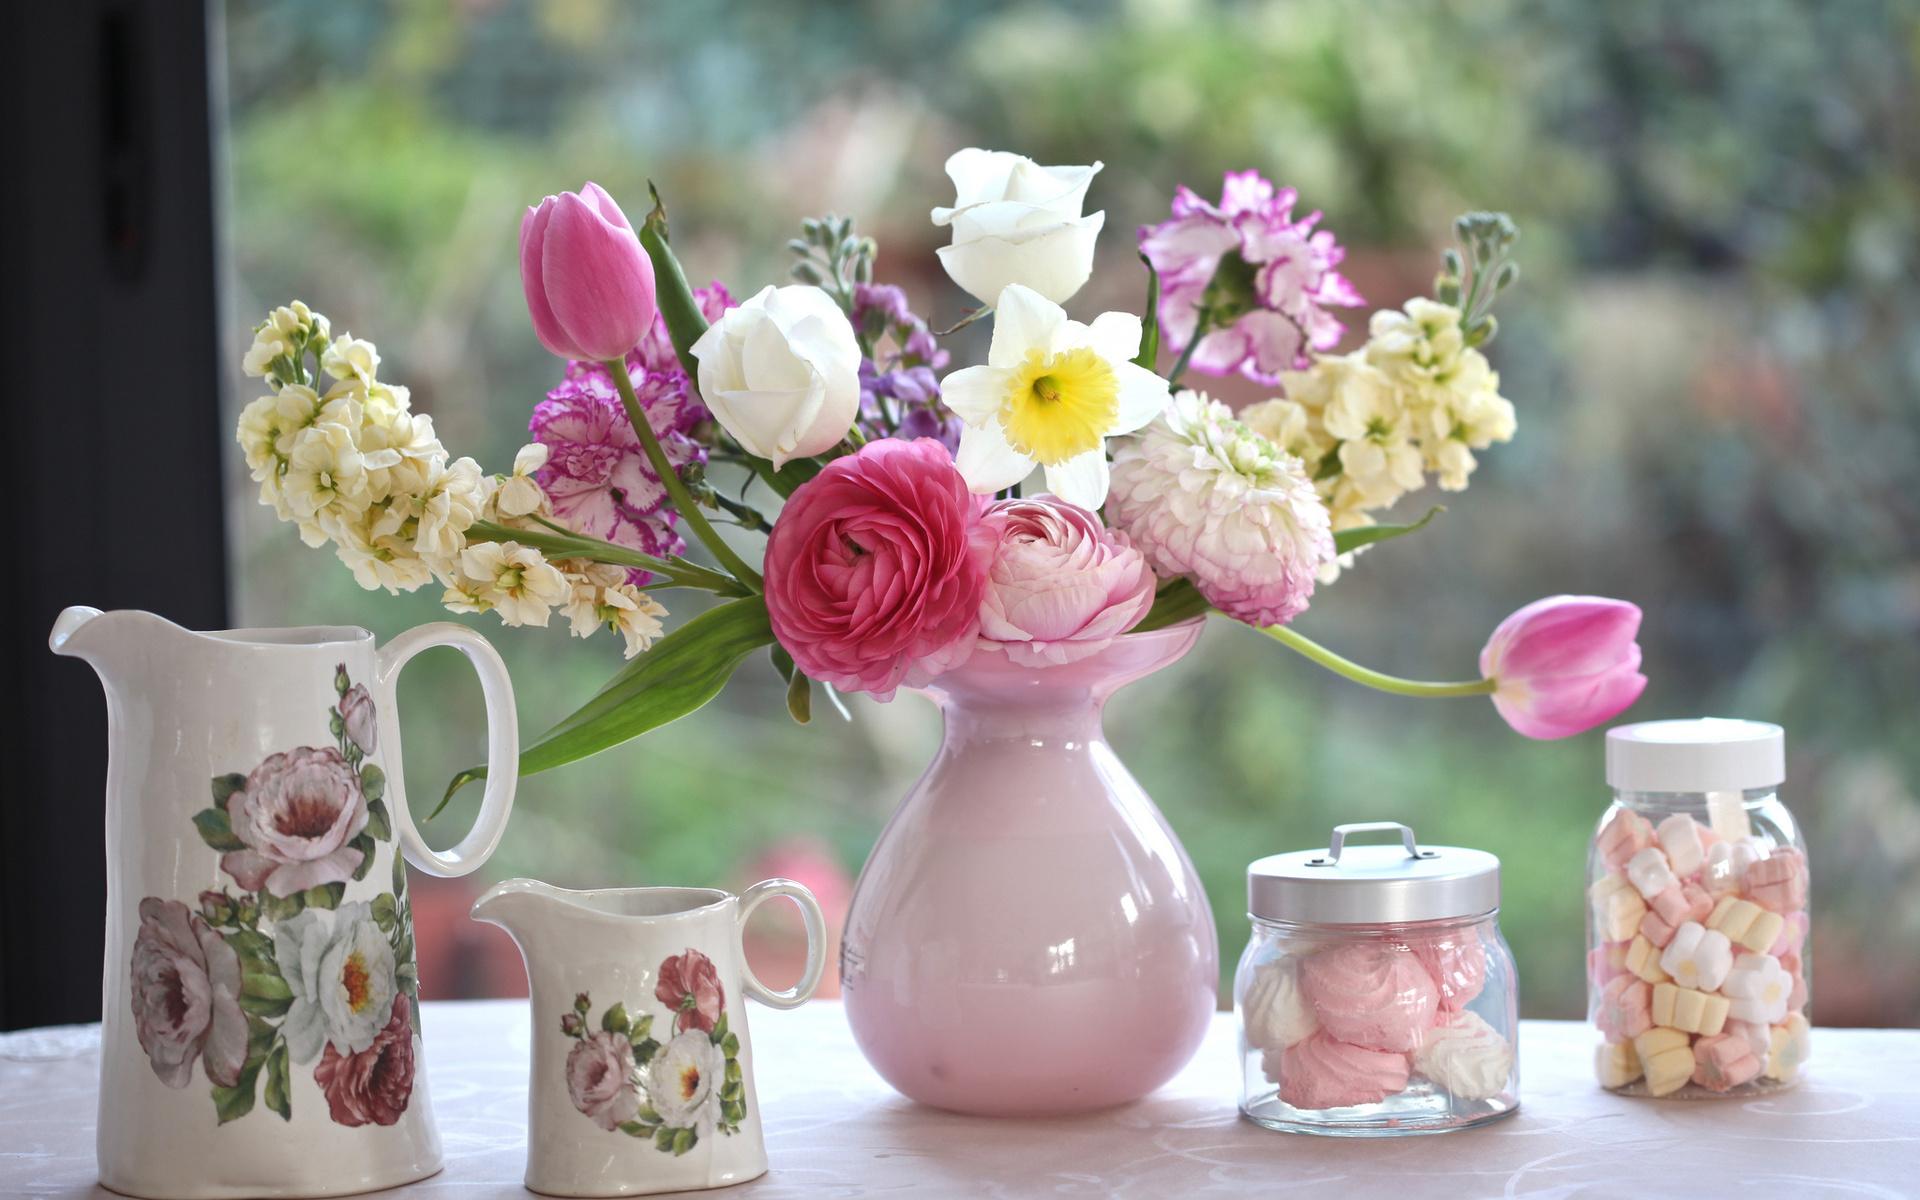 тюльпаны ваза море  № 1012820 без смс